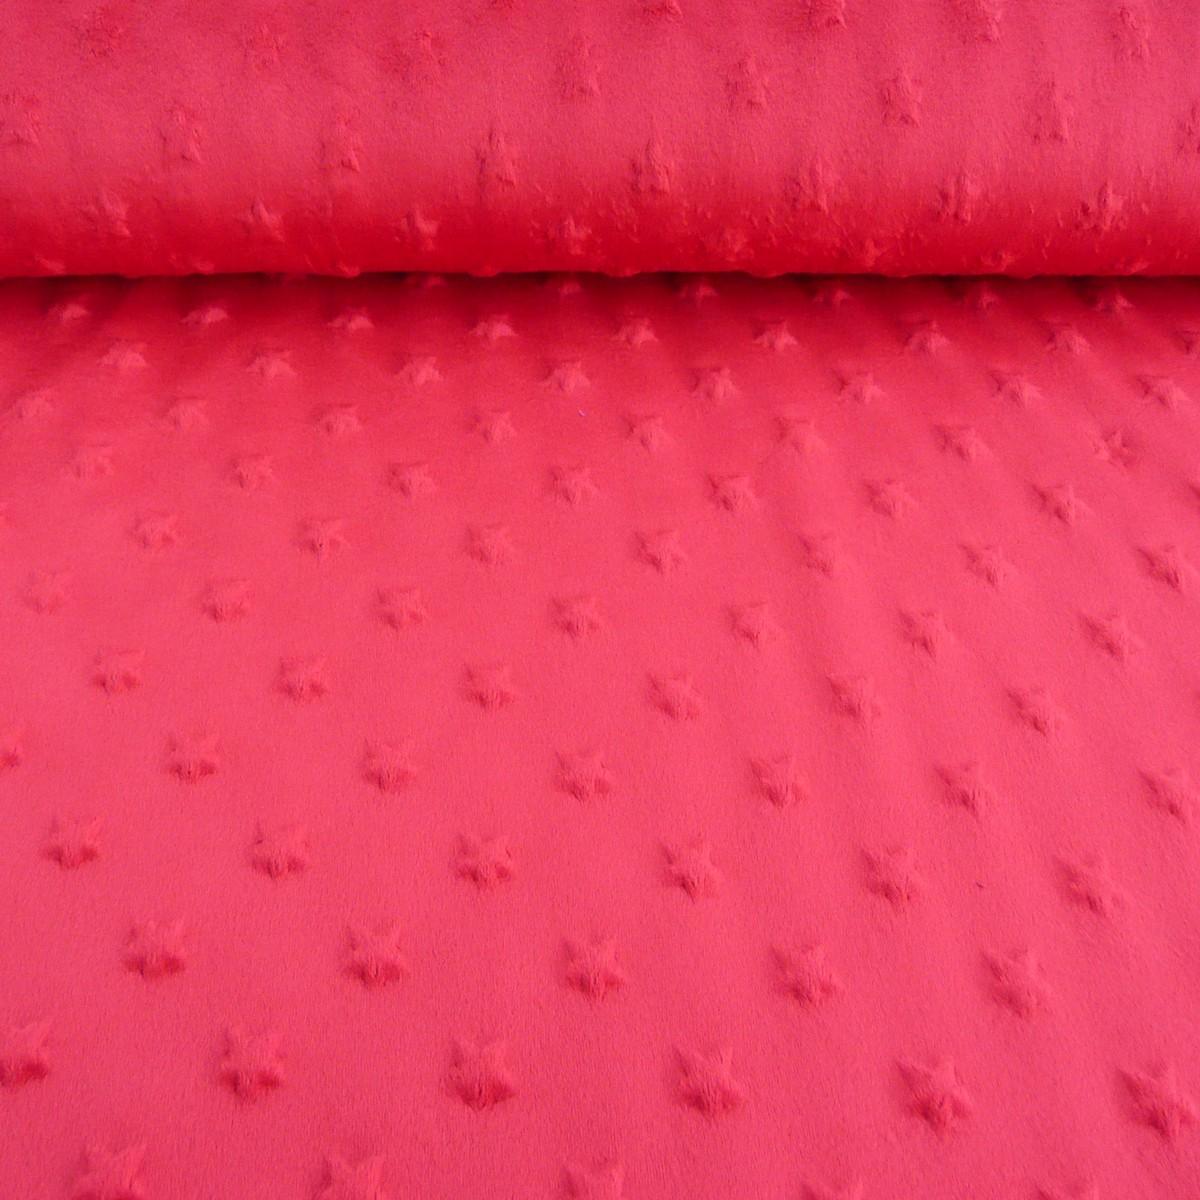 fleece minky stars sterne noppen rot flausch stoff fell pl sch stoffe stoffe uni fleece. Black Bedroom Furniture Sets. Home Design Ideas